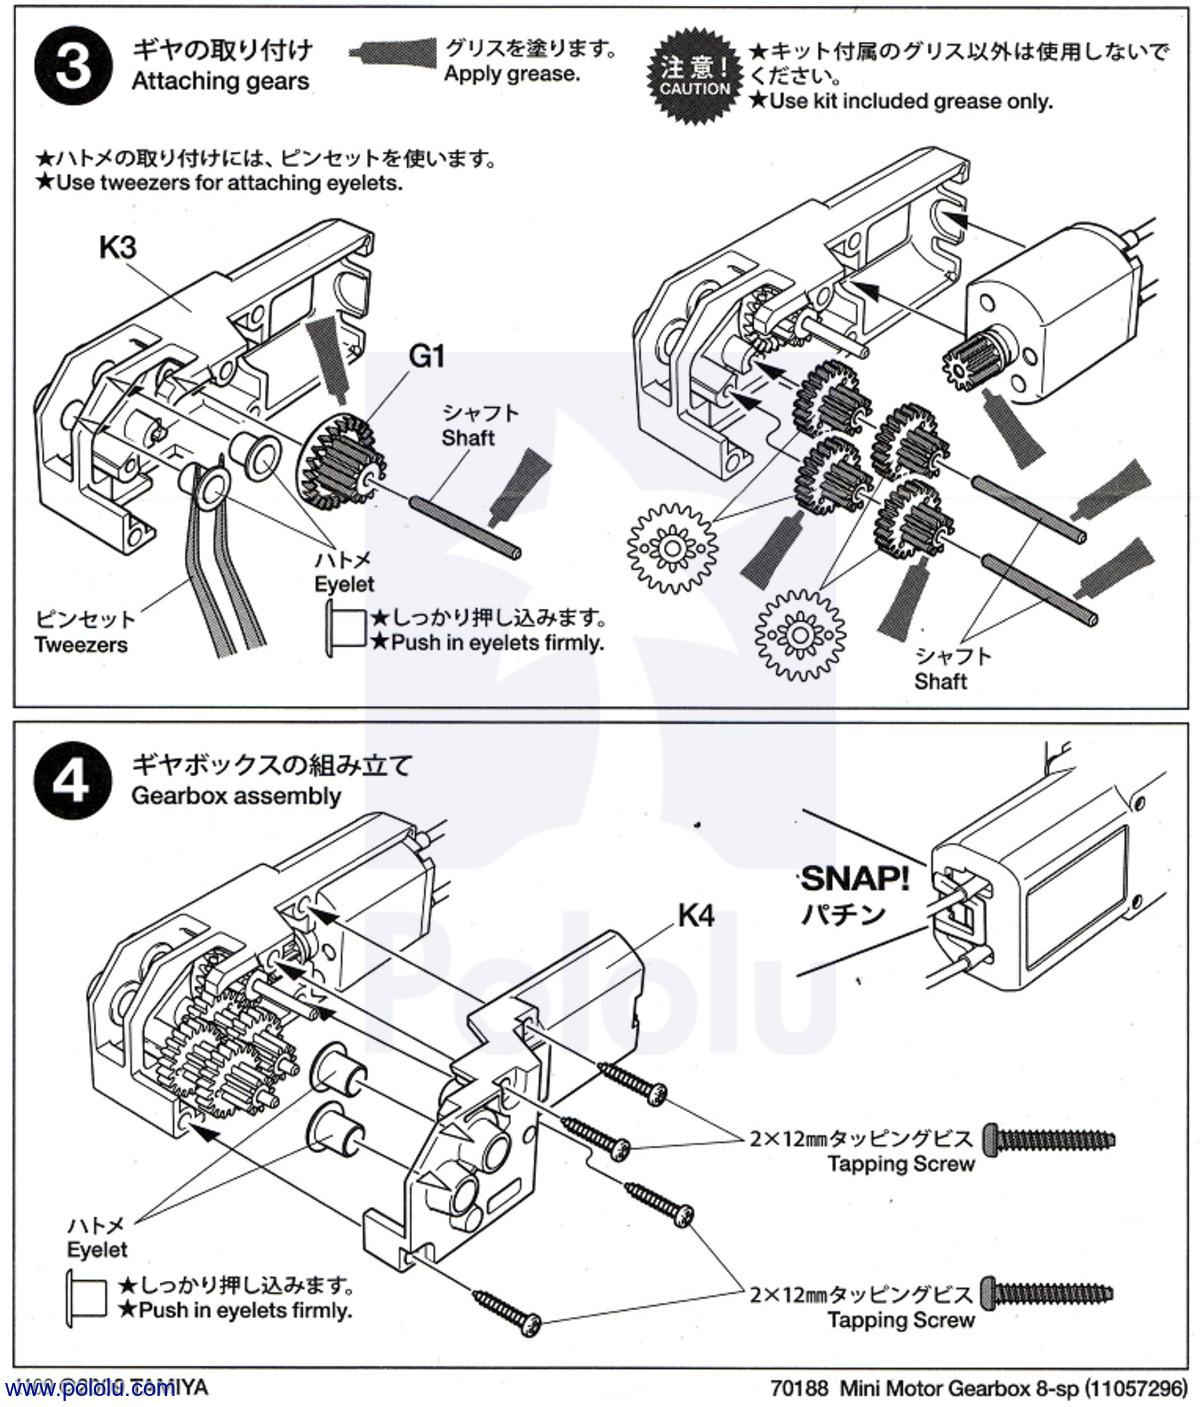 Pololu Tamiya 70188 Mini Motor Gearbox 8 Speed Kit